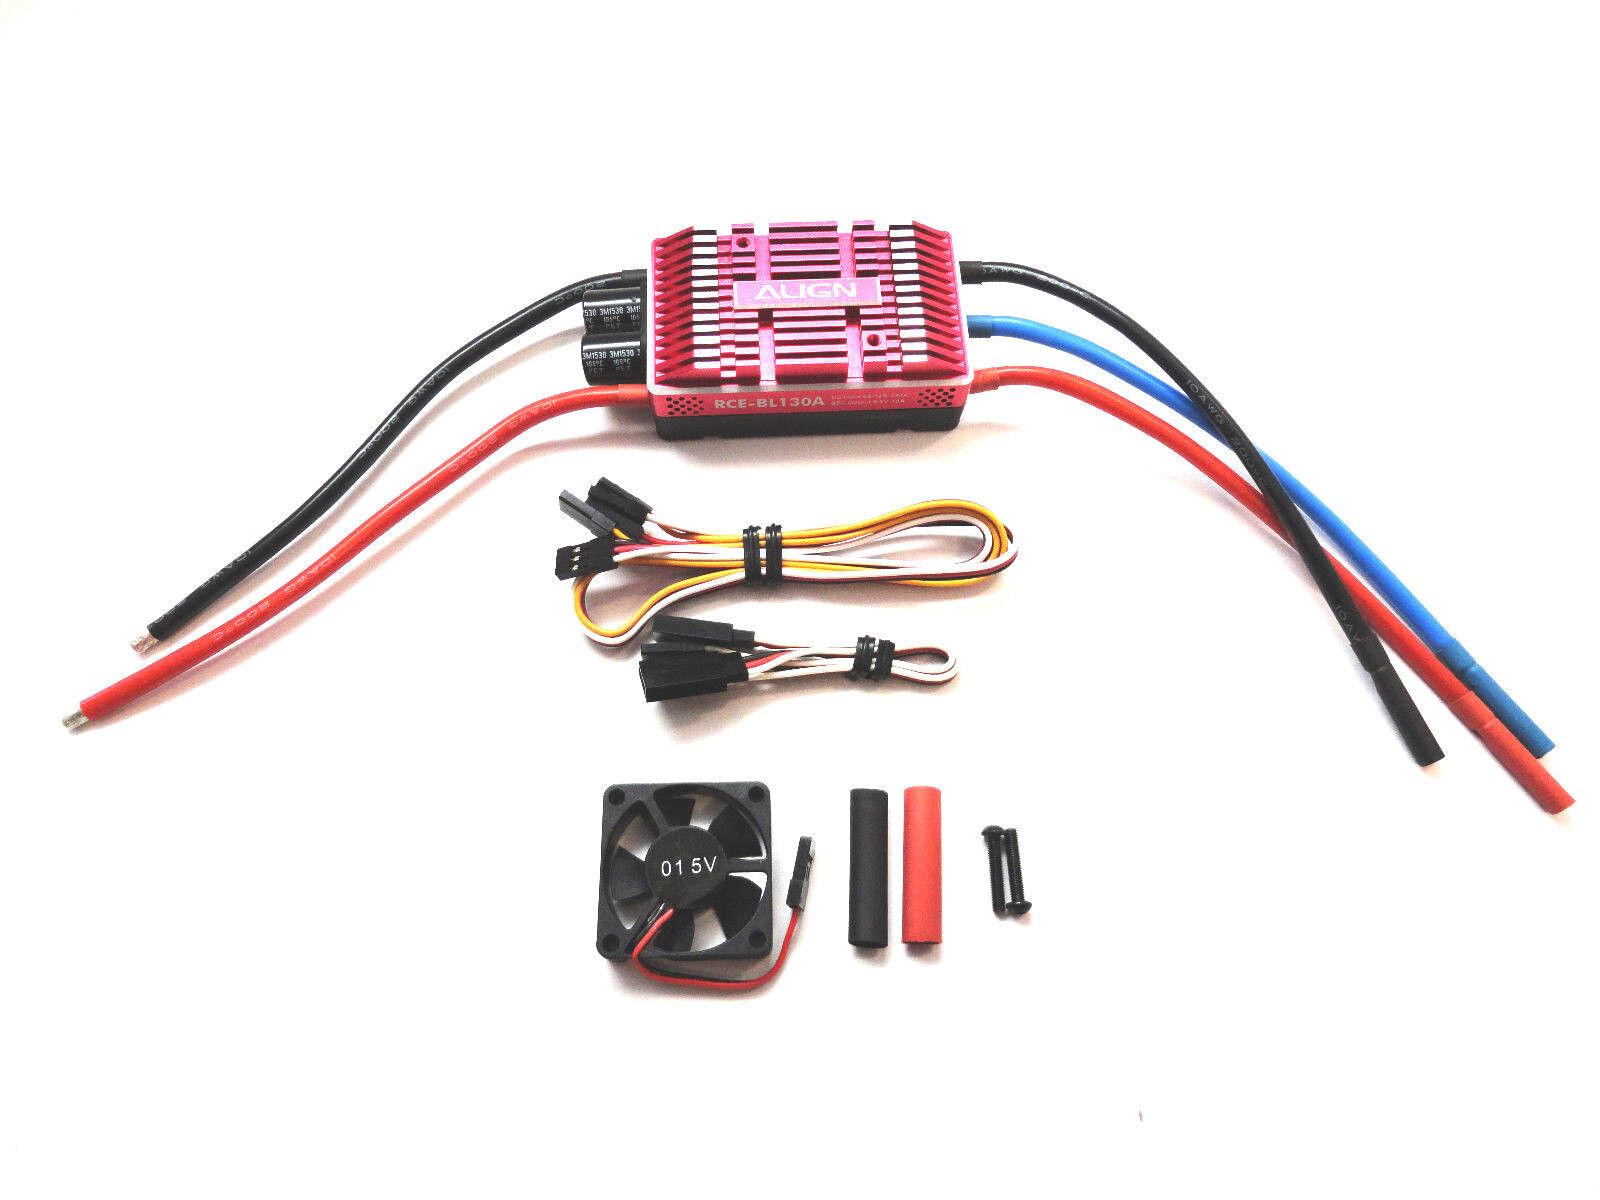 Align RCE-BL130A 130A sin Escobillas Esc Control de Velocidad HES13001